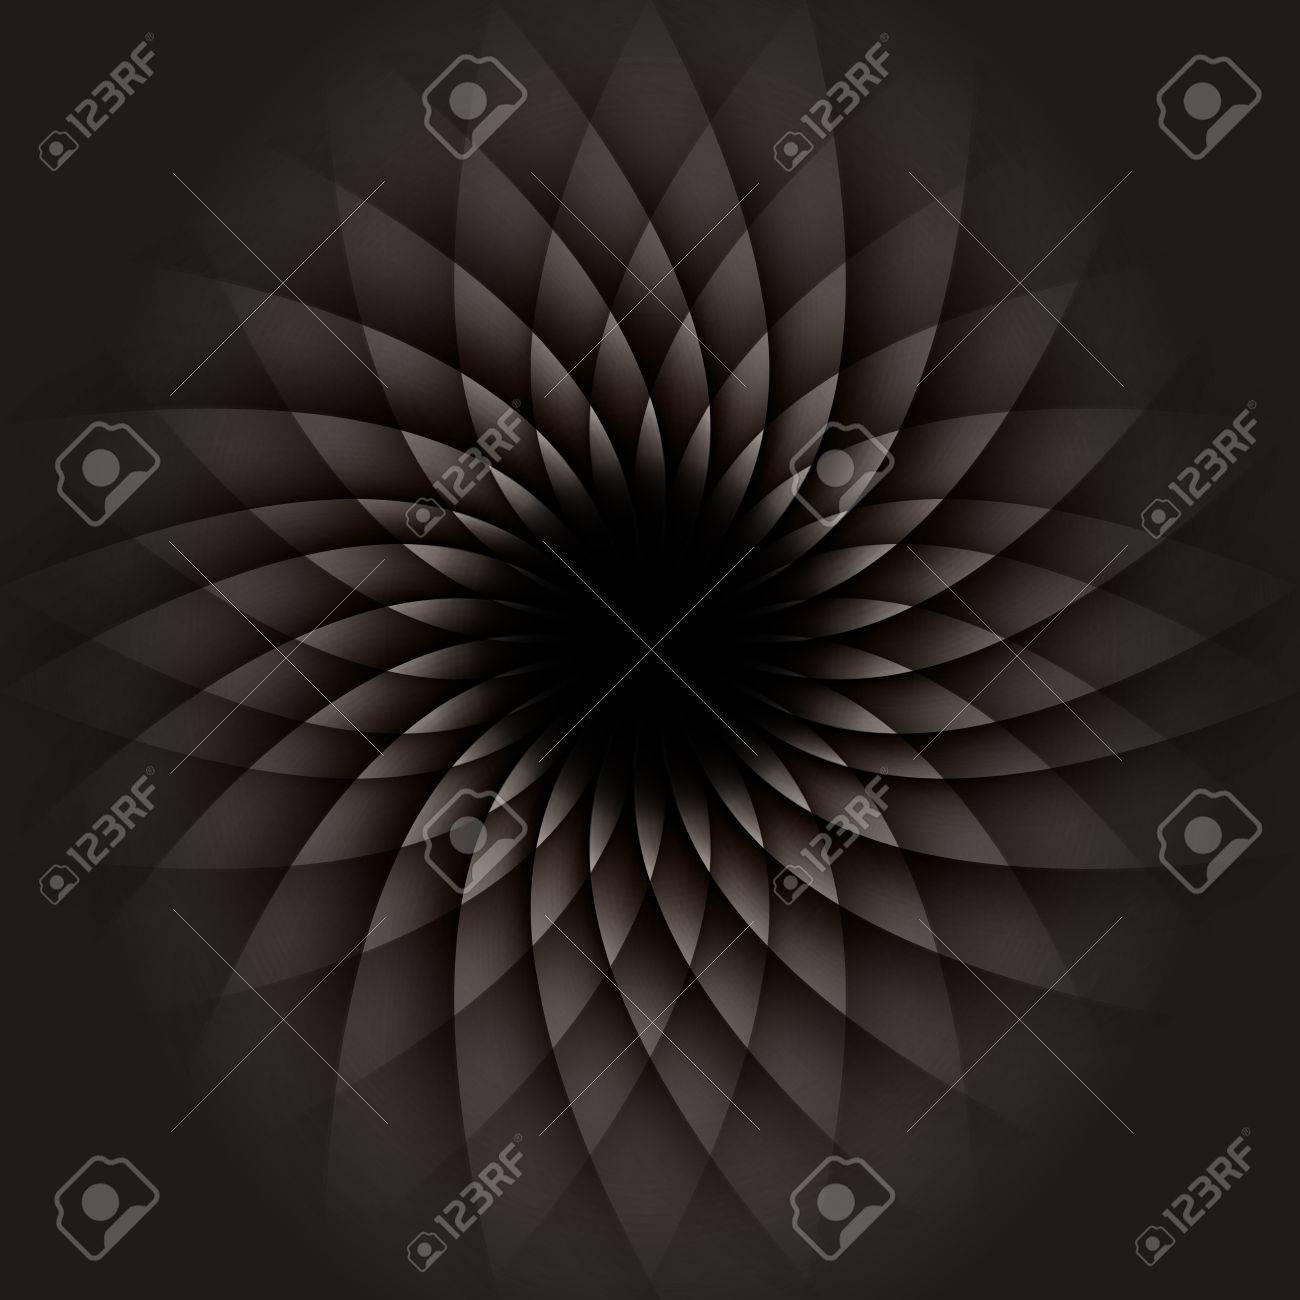 Dark Geometric Flower. Abstract Background - 57237527